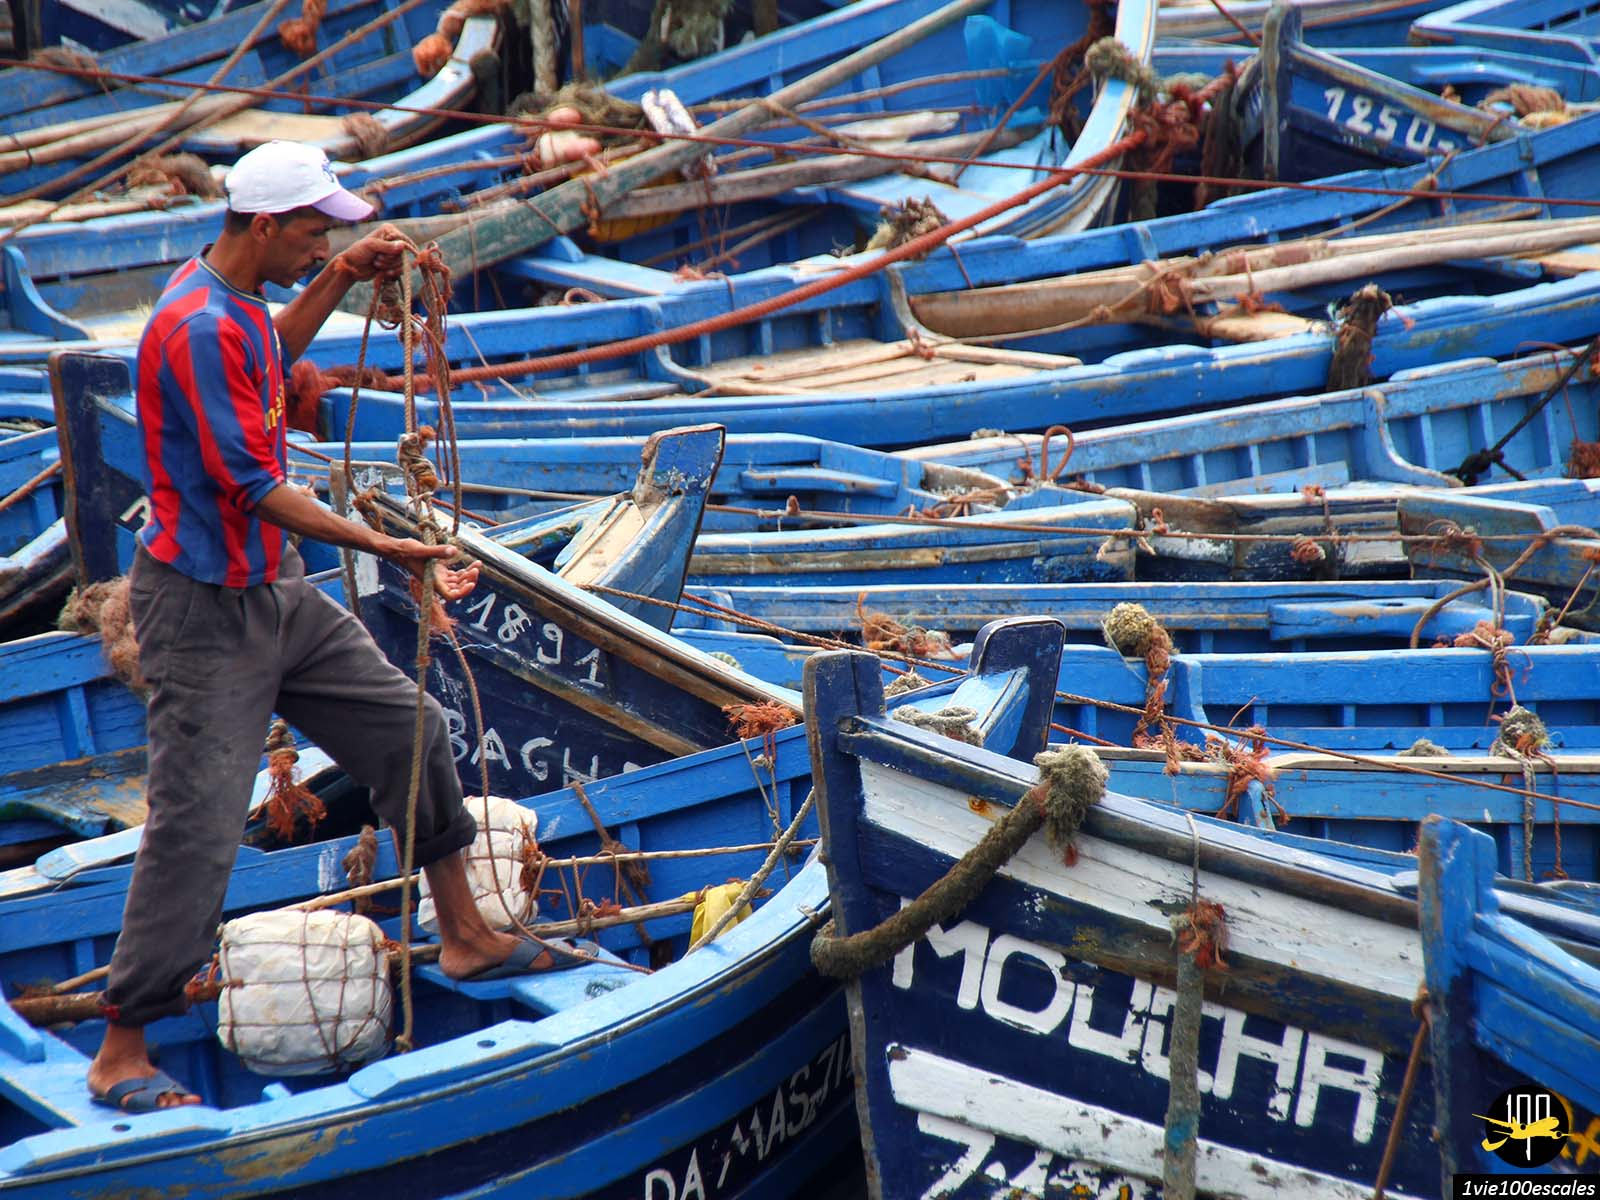 Escale #092 Essaouira